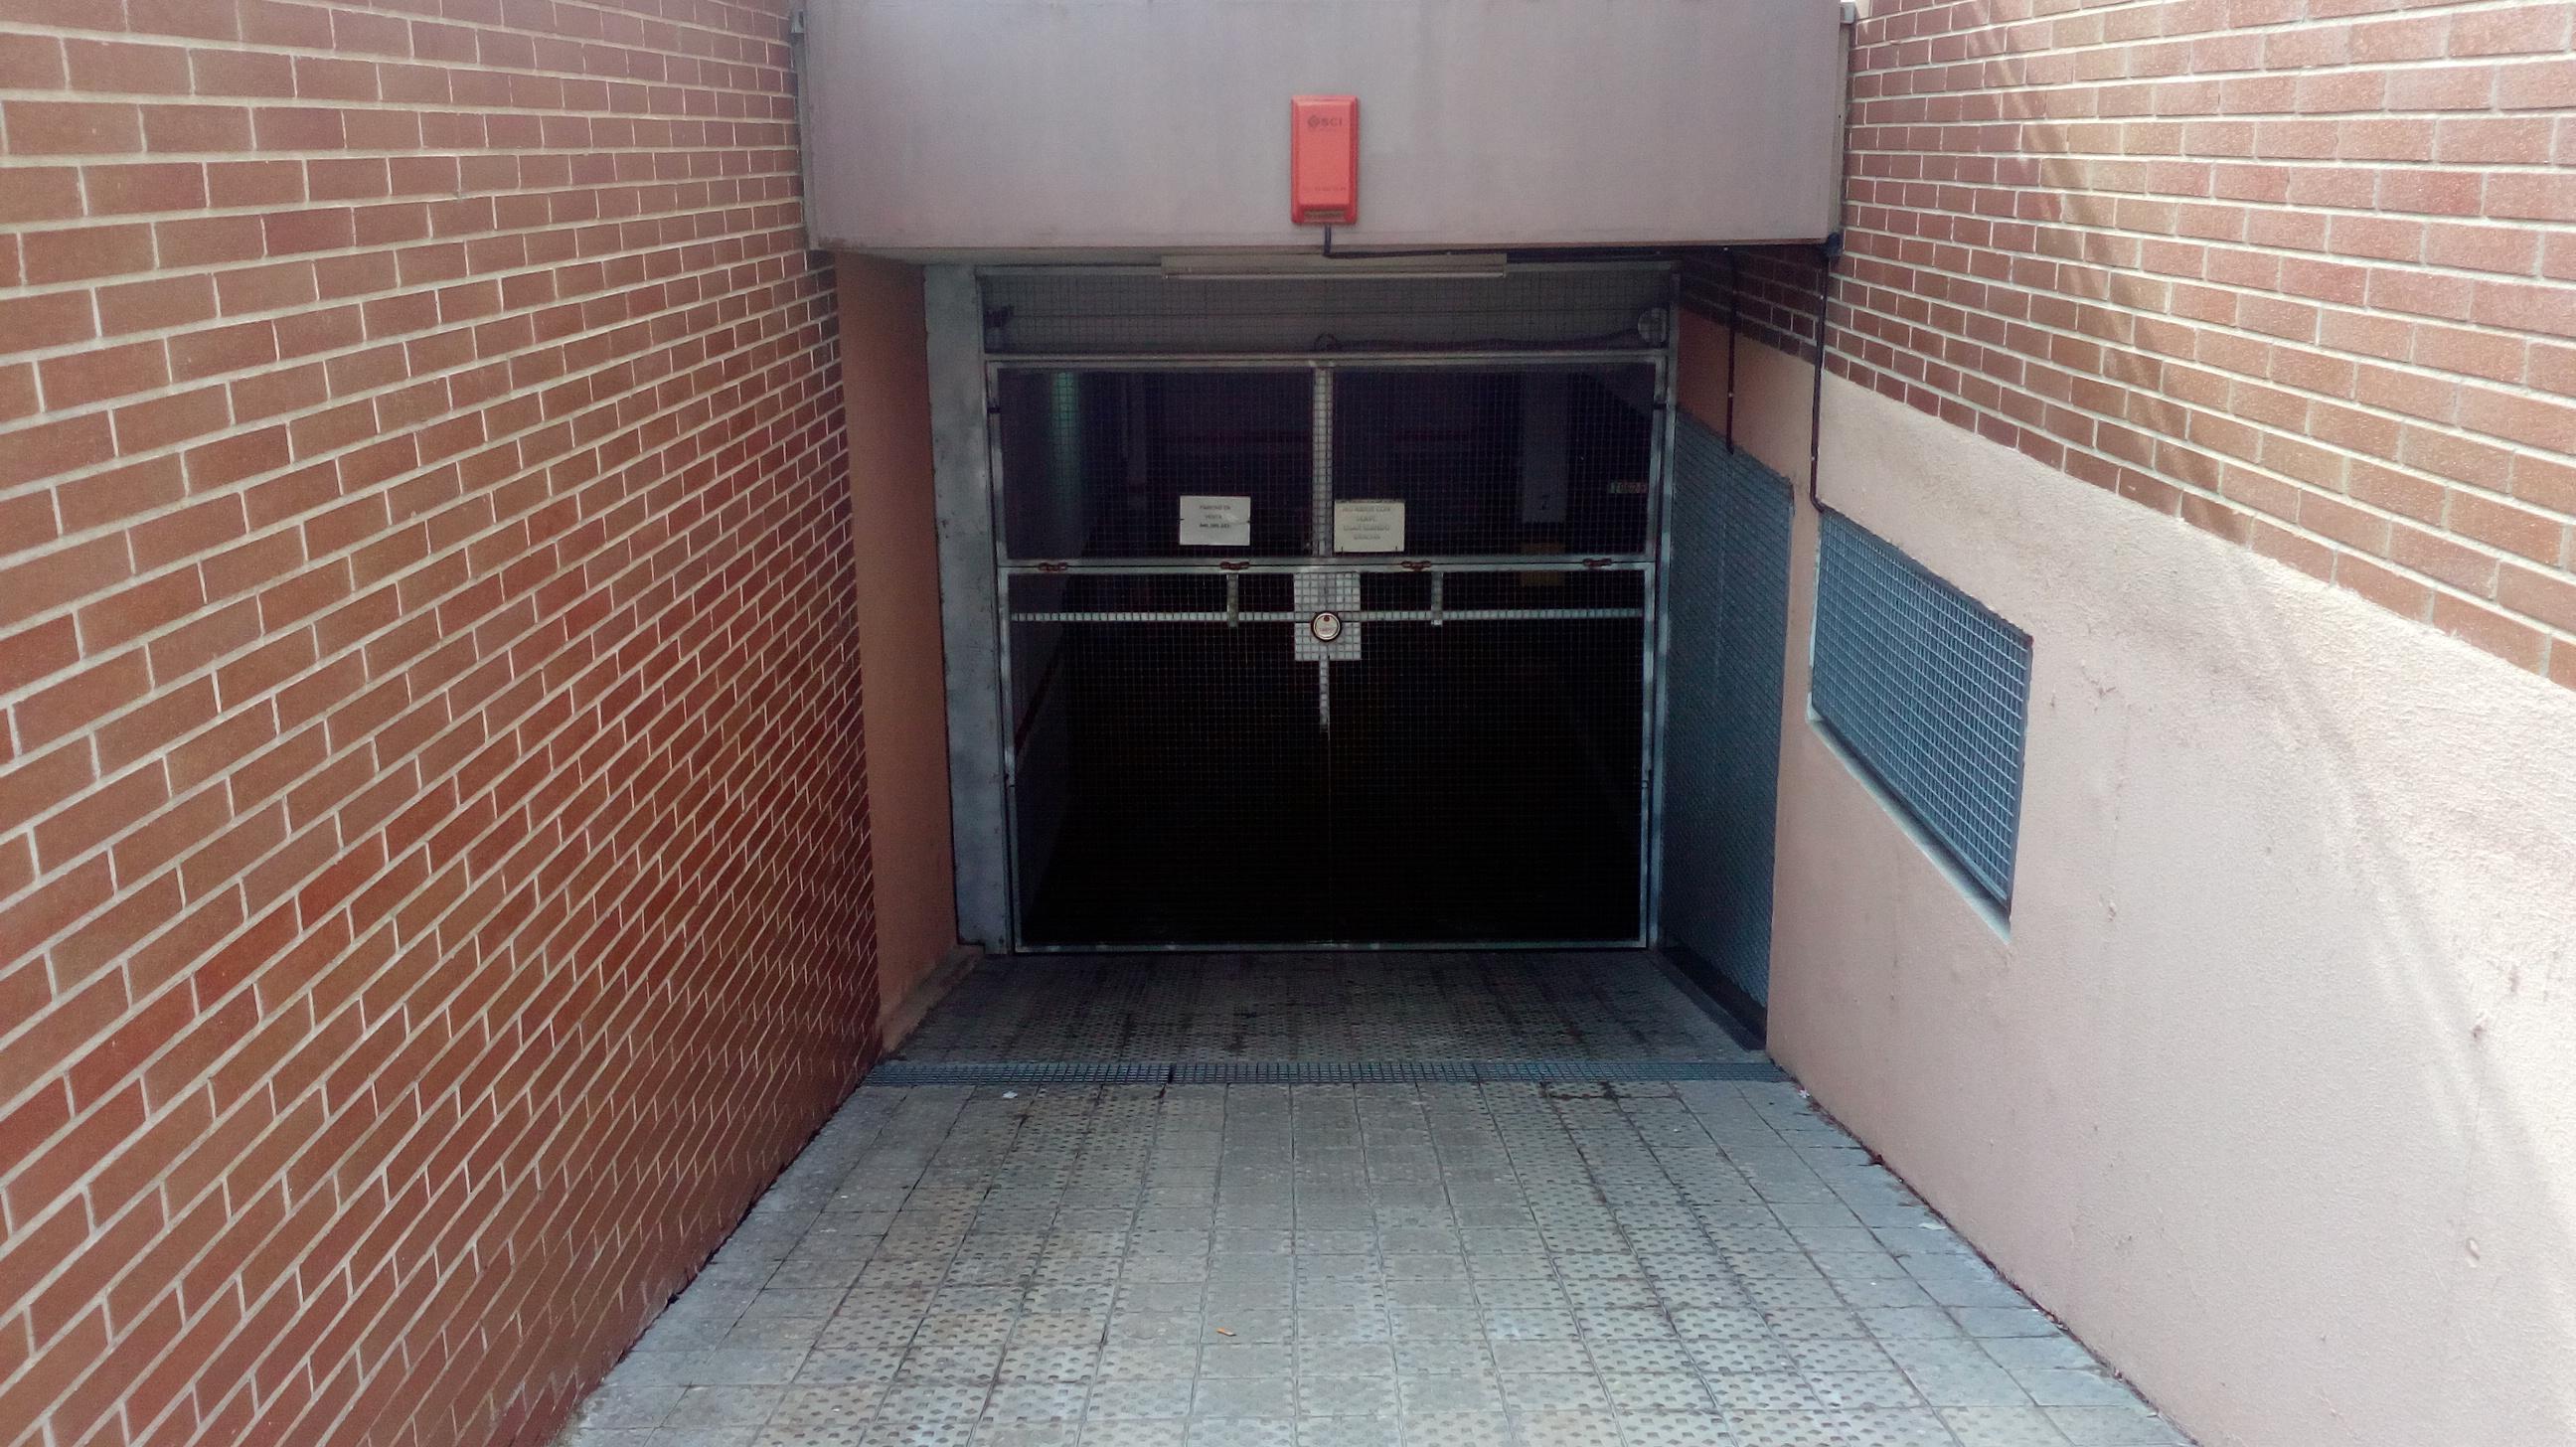 175263 - Parking Coche en venta en Montcada I Reixac / Av Terra Nostra n